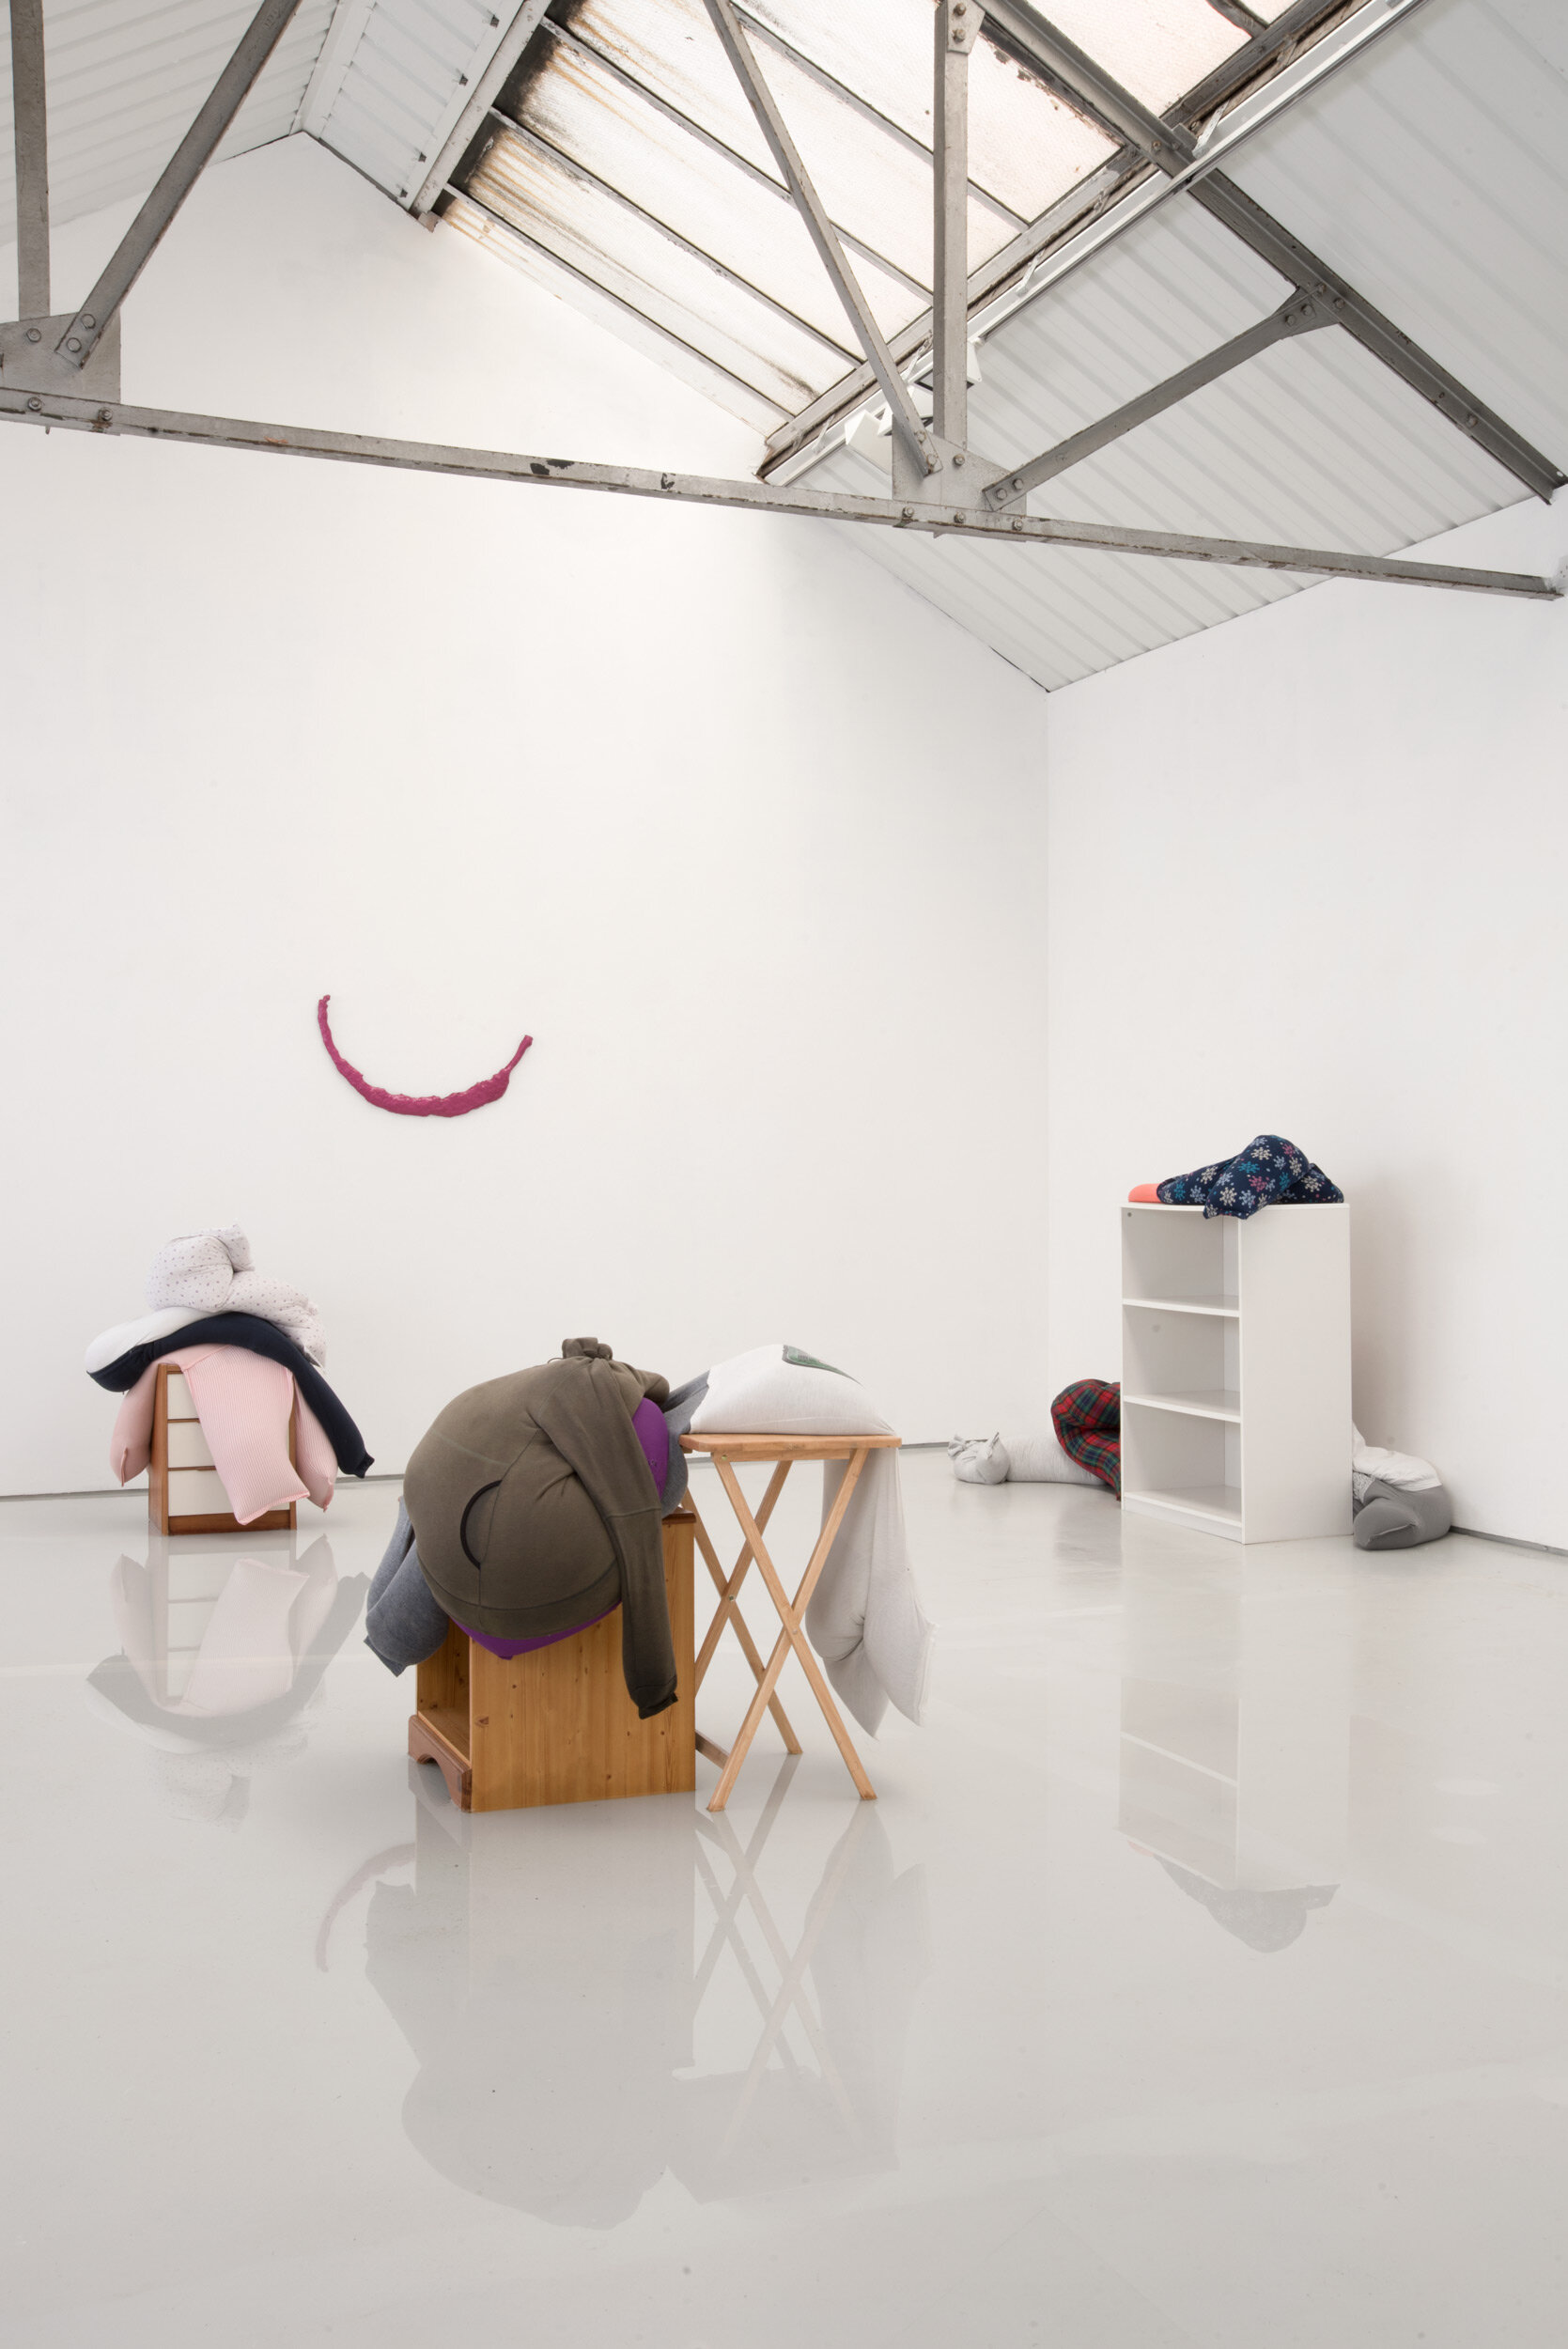 Fall, slump, drop on a bedside cabinet in water[...], Installation View, Alex Farrar, Bloc Projects, 2019, 6.jpg